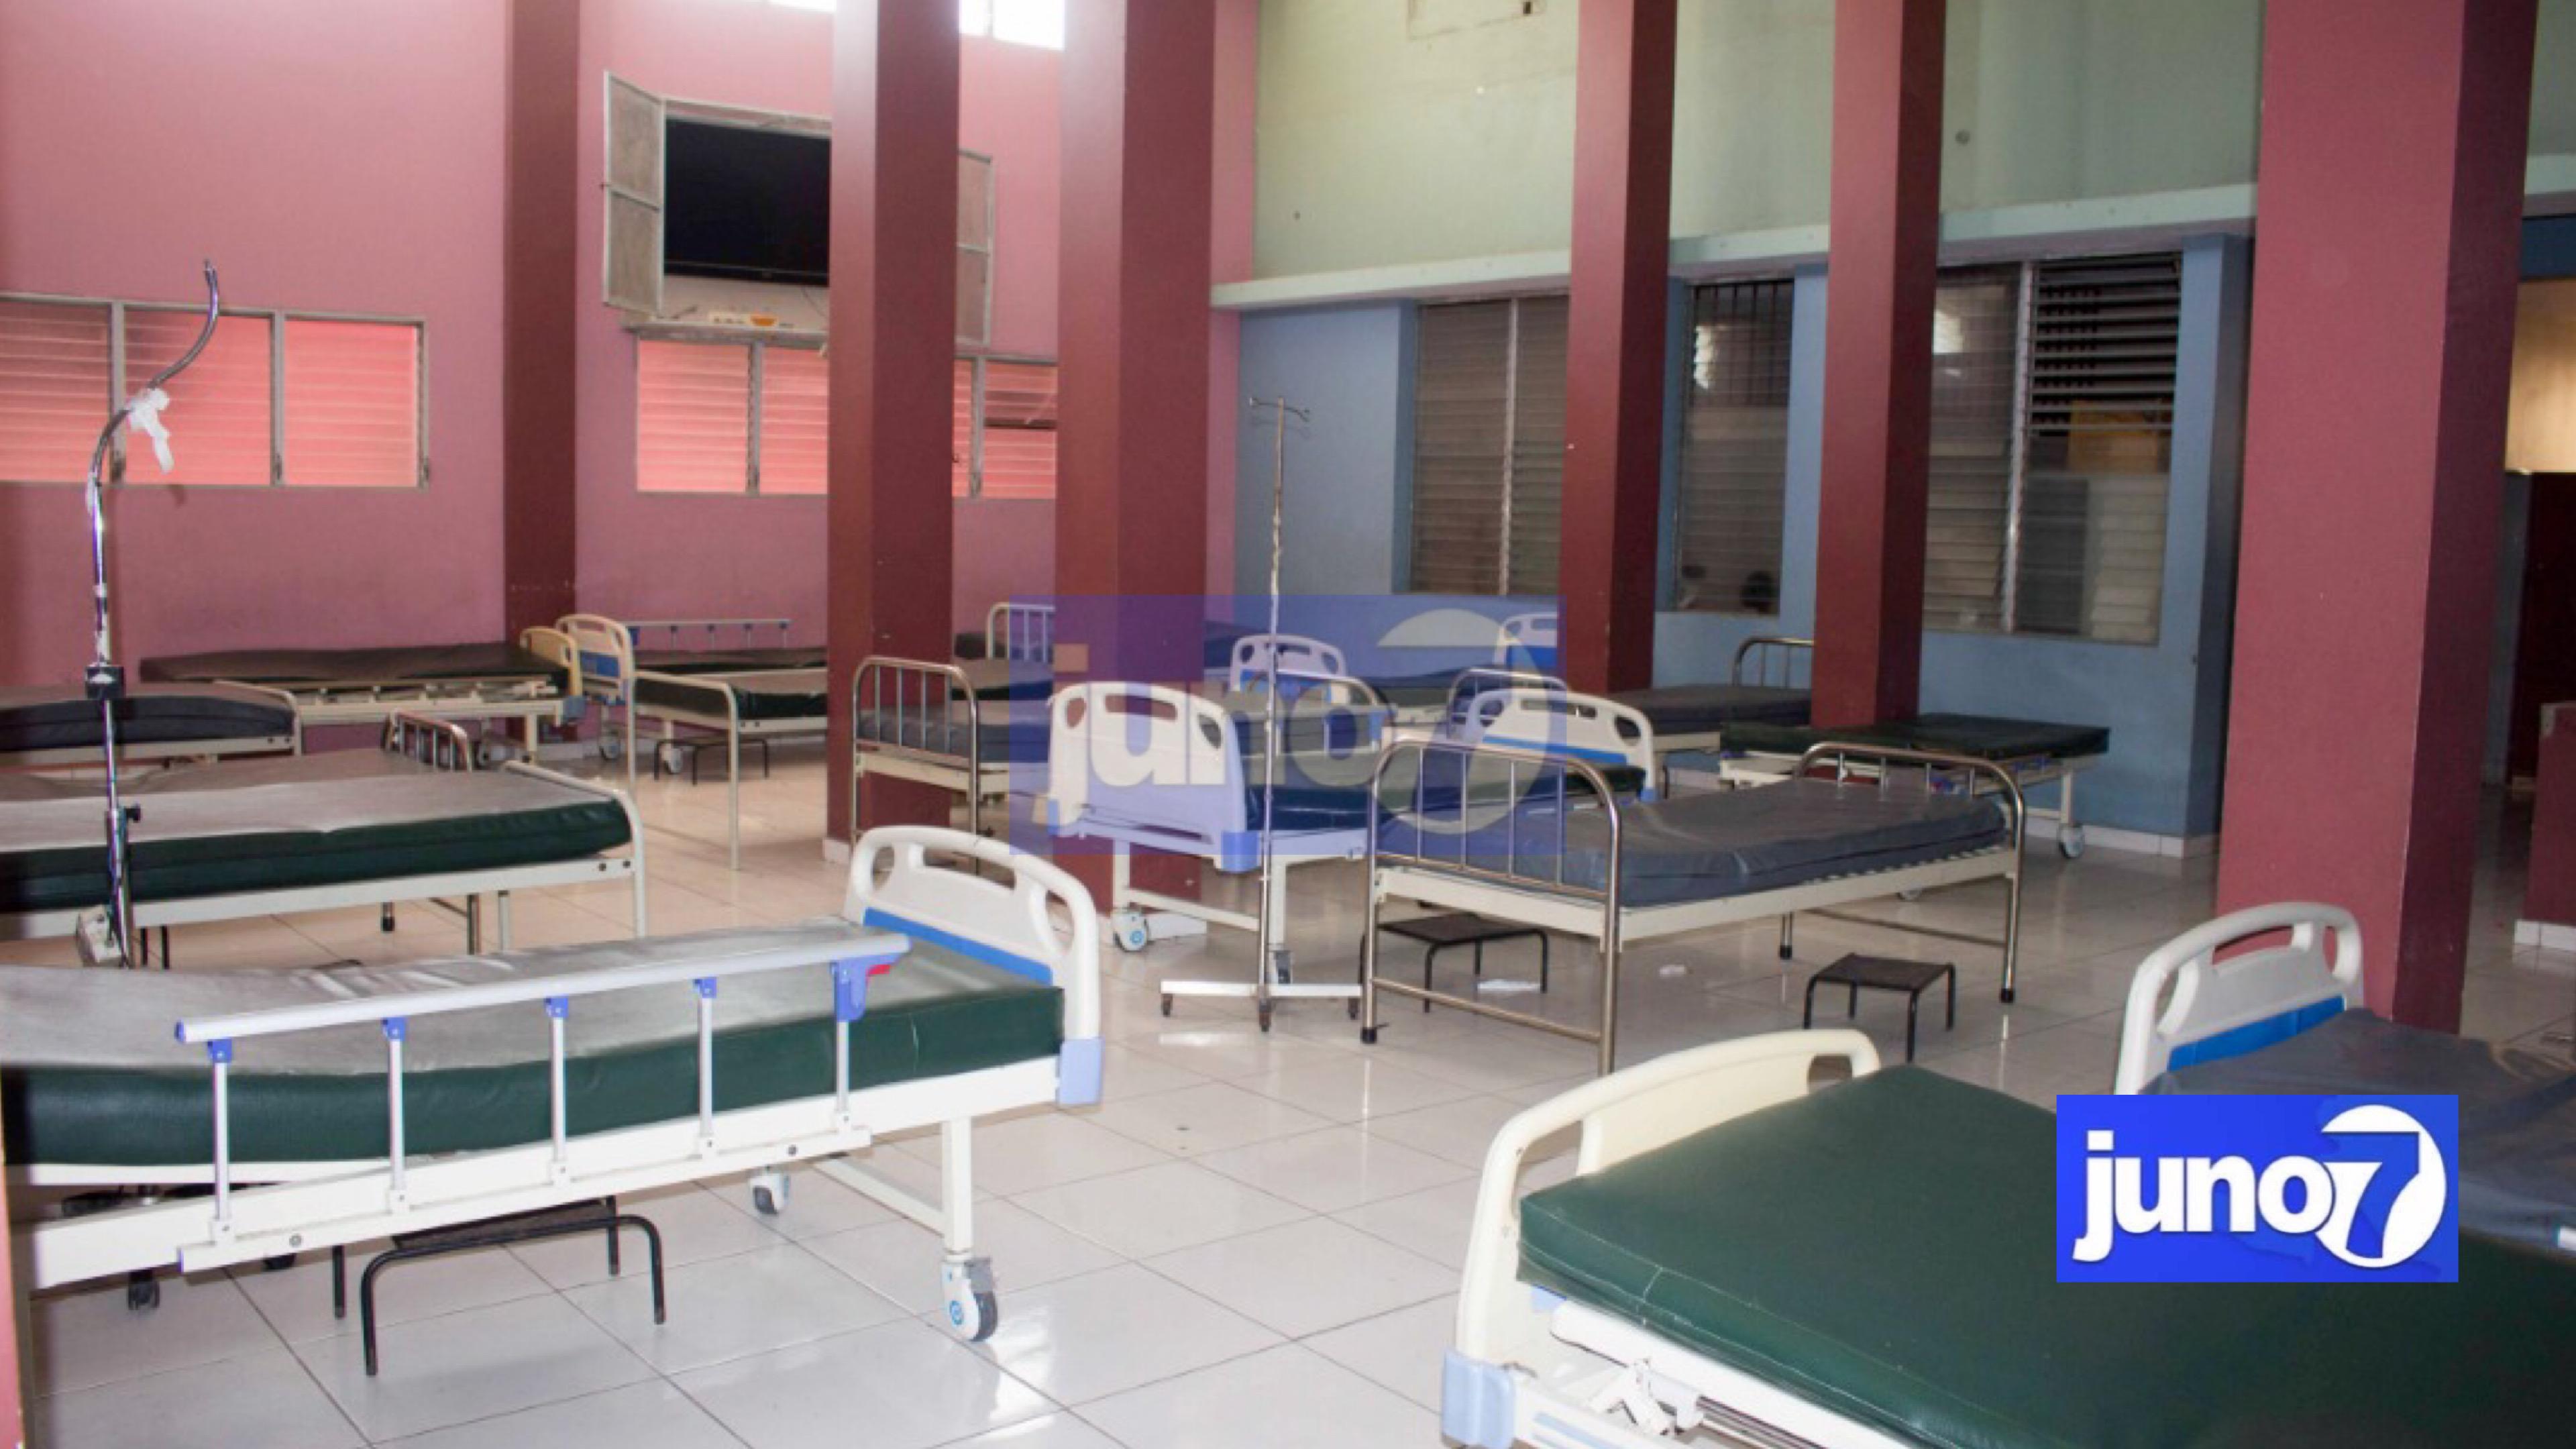 Haïti Santé: l'Hôpital La Paix en grève